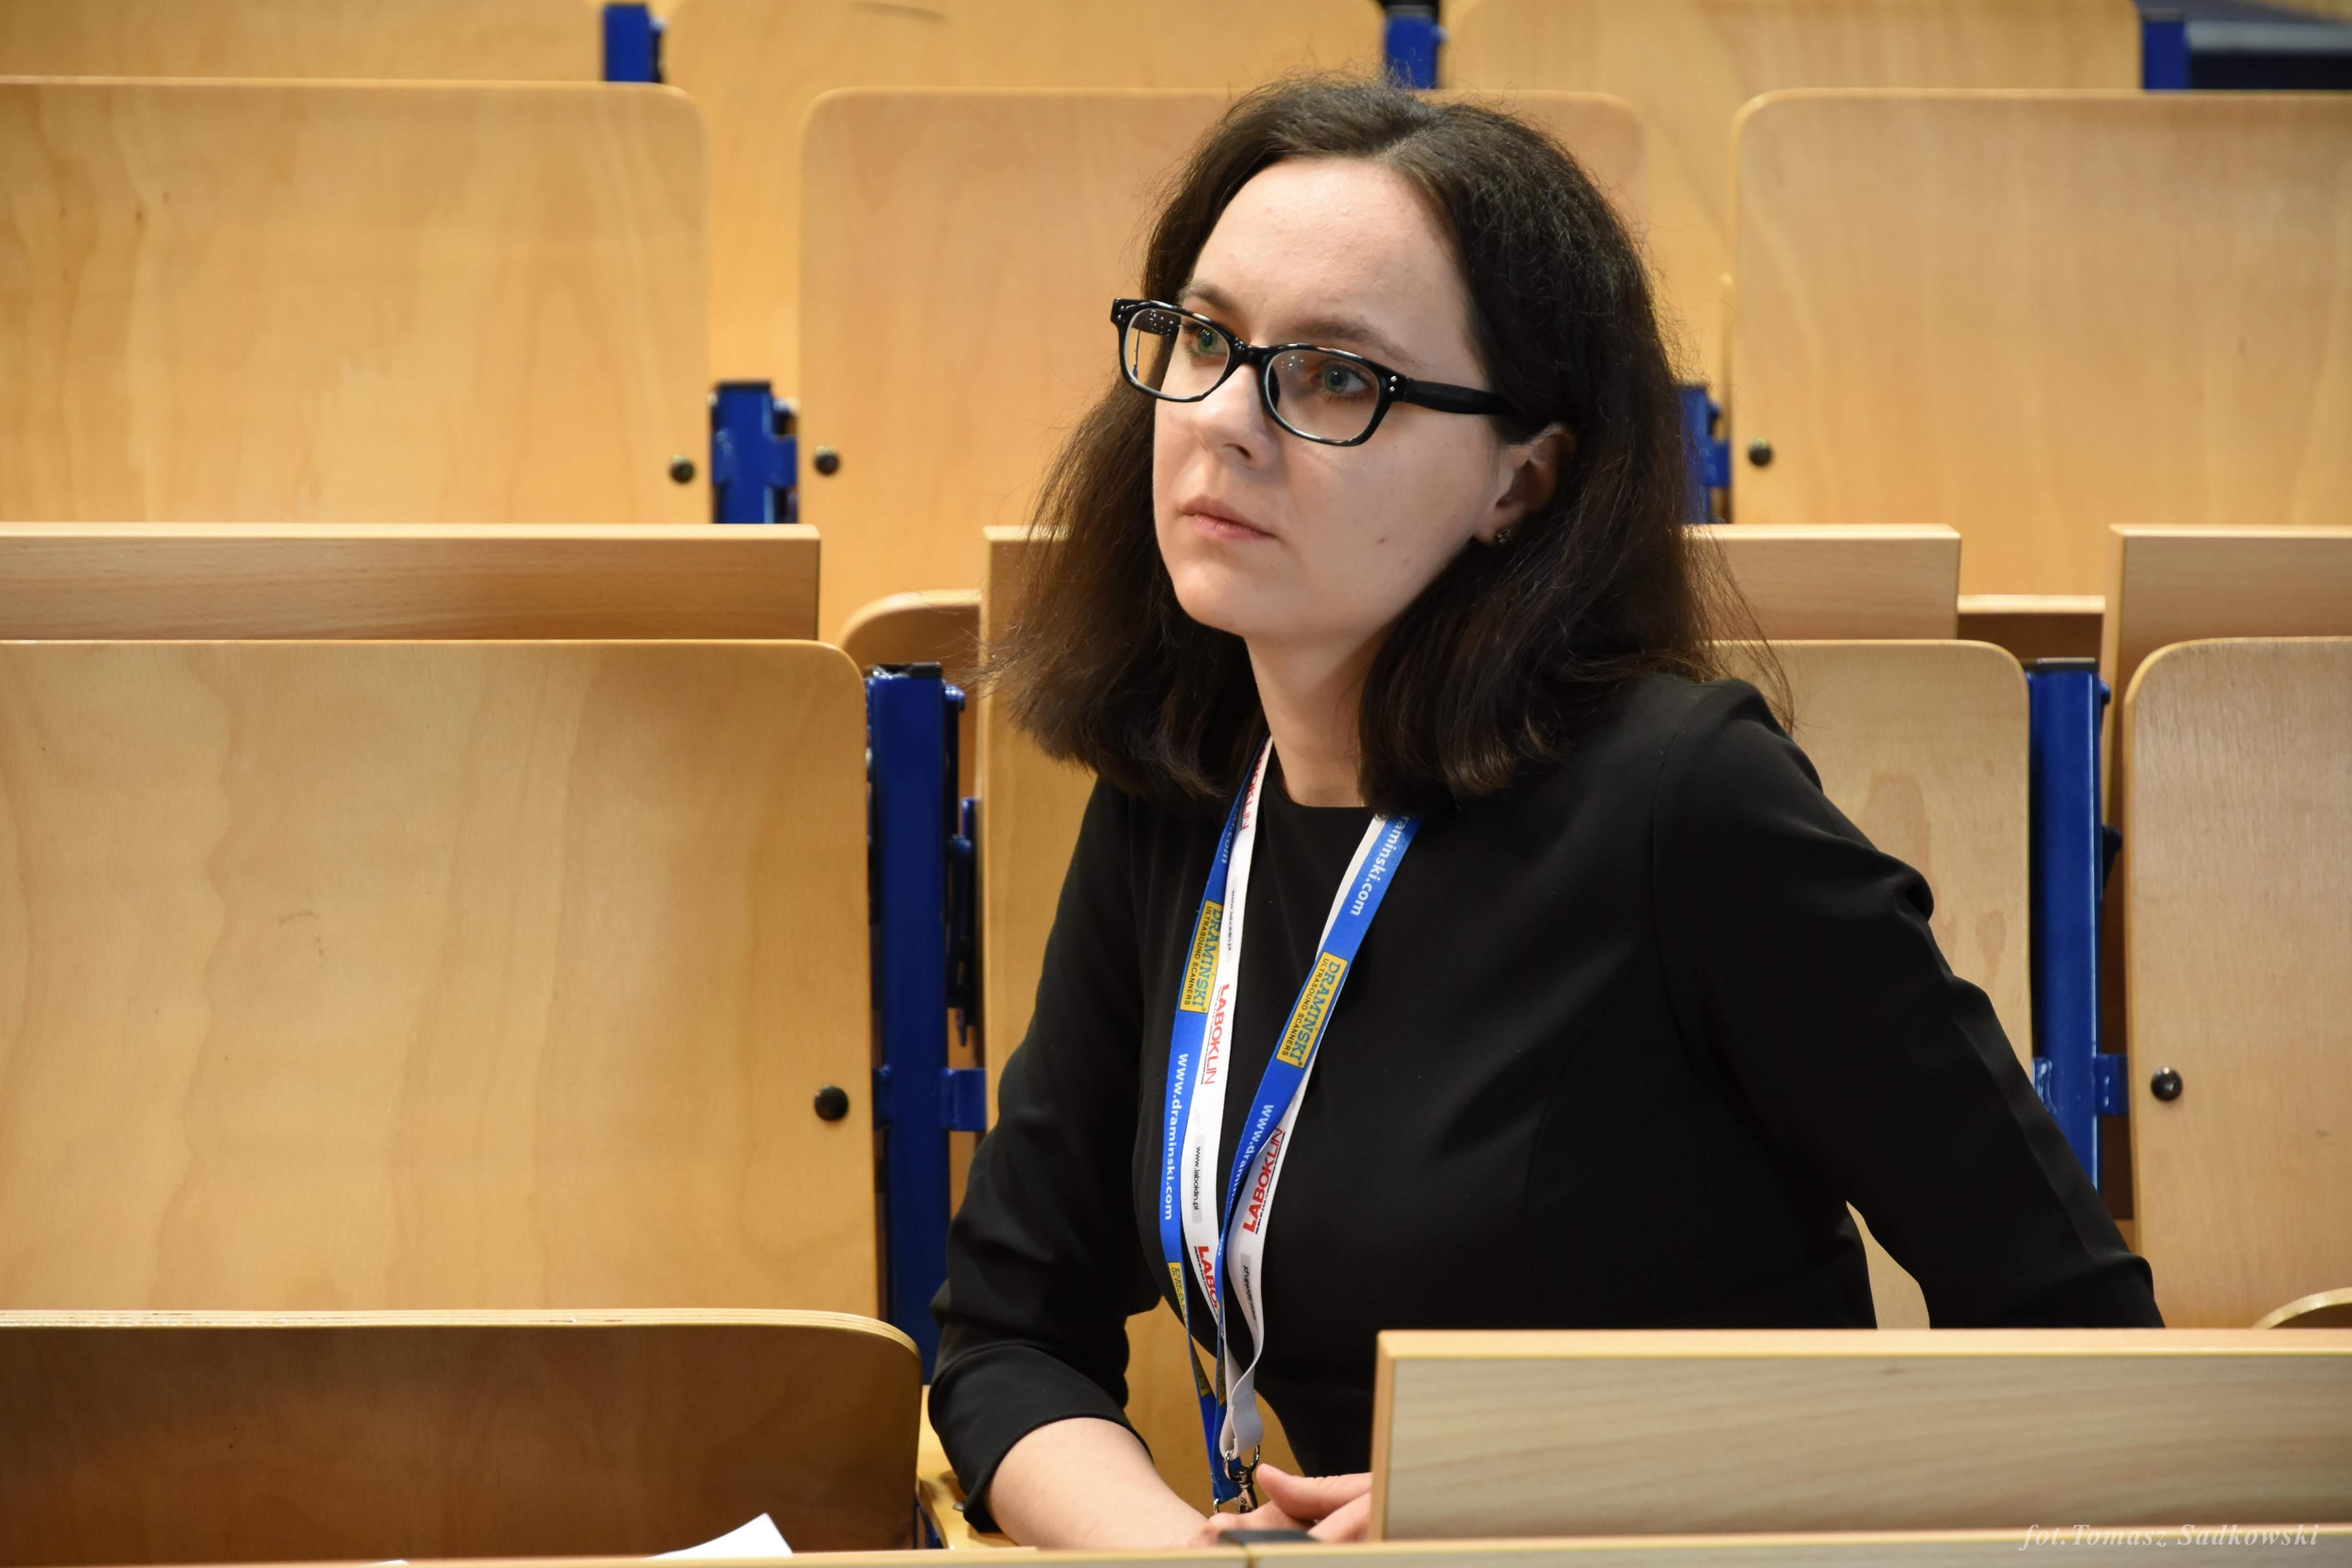 Zuza Strzałkowska, president of our society